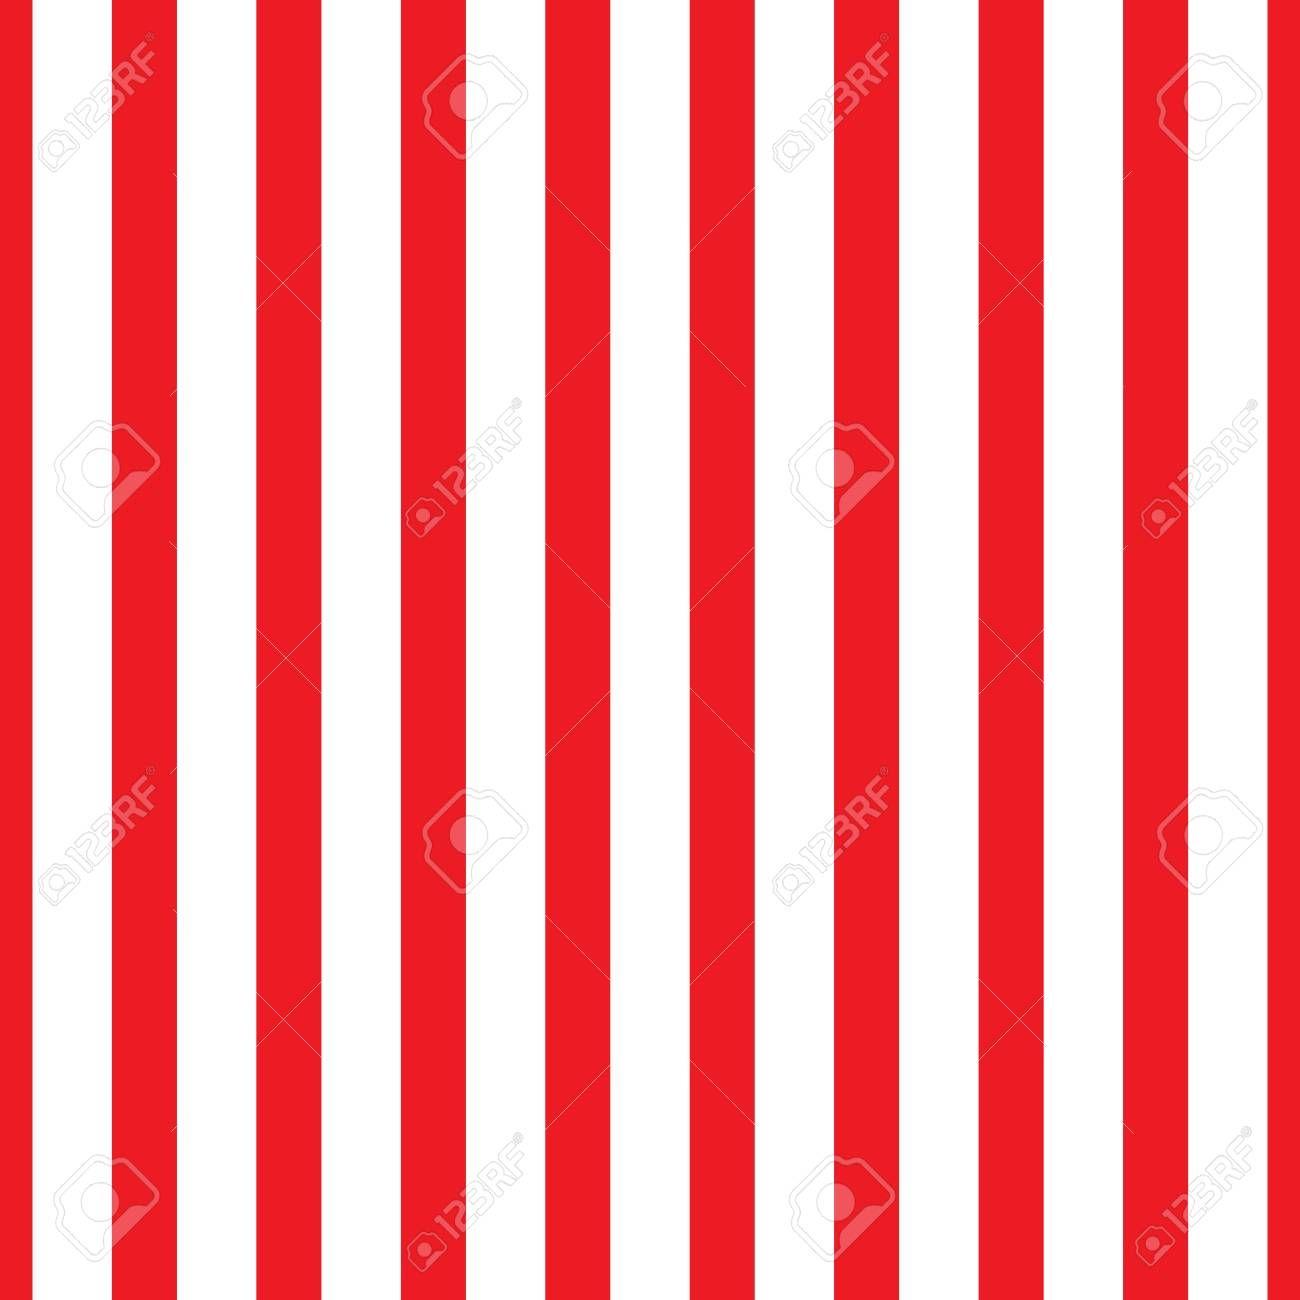 Seamless Vertical Stripe Pattern Vector Red And White Background Aff Stripe Pattern Seamless Stripes Pattern Vector Character Design White Background